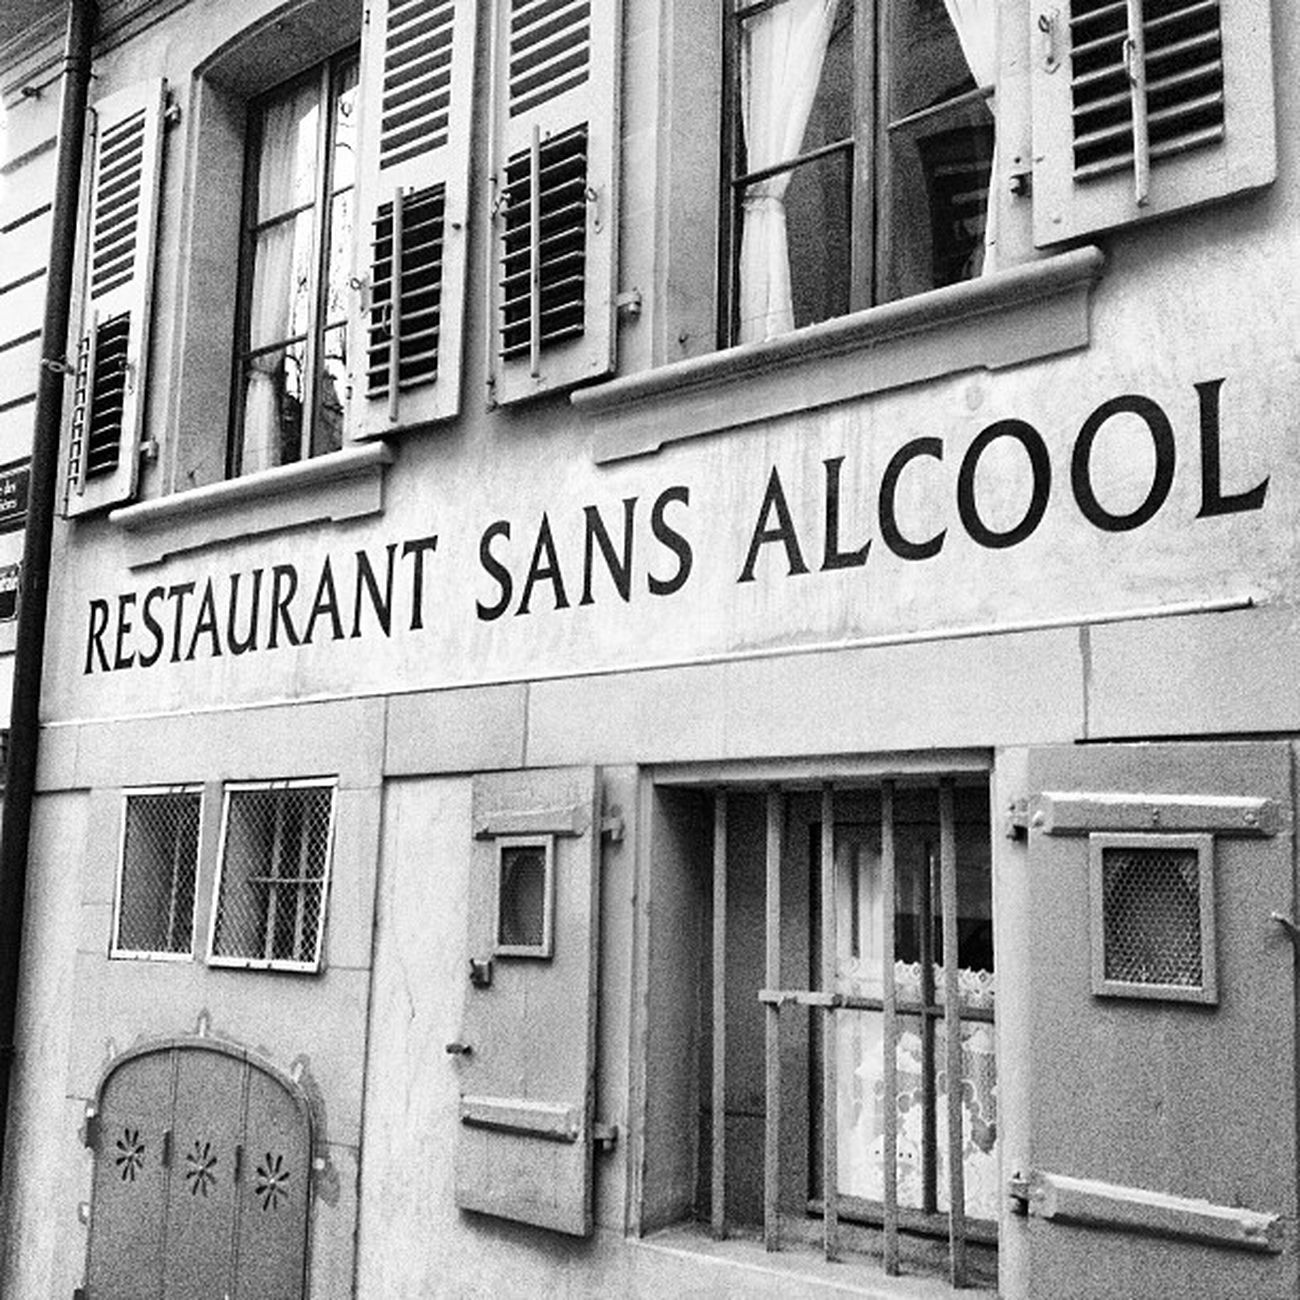 #restaurant in #geneve, was soll ich da? Bnw_society Bwstyles_gf Noir Instagood Blackandwhite Tagsforlikes Restaurant Fineart_photobw Monochrome Igersbnw Bw Irox_bw Photooftheday Insta_bw Geneve Instablackandwhite Bnw Insta_pick_bw Monoart Bwstyleoftheday Monotone Bw_crew Bw_lover Bwwednesday Bw_society Bw_photooftheday Monochromatic Picolli Jj